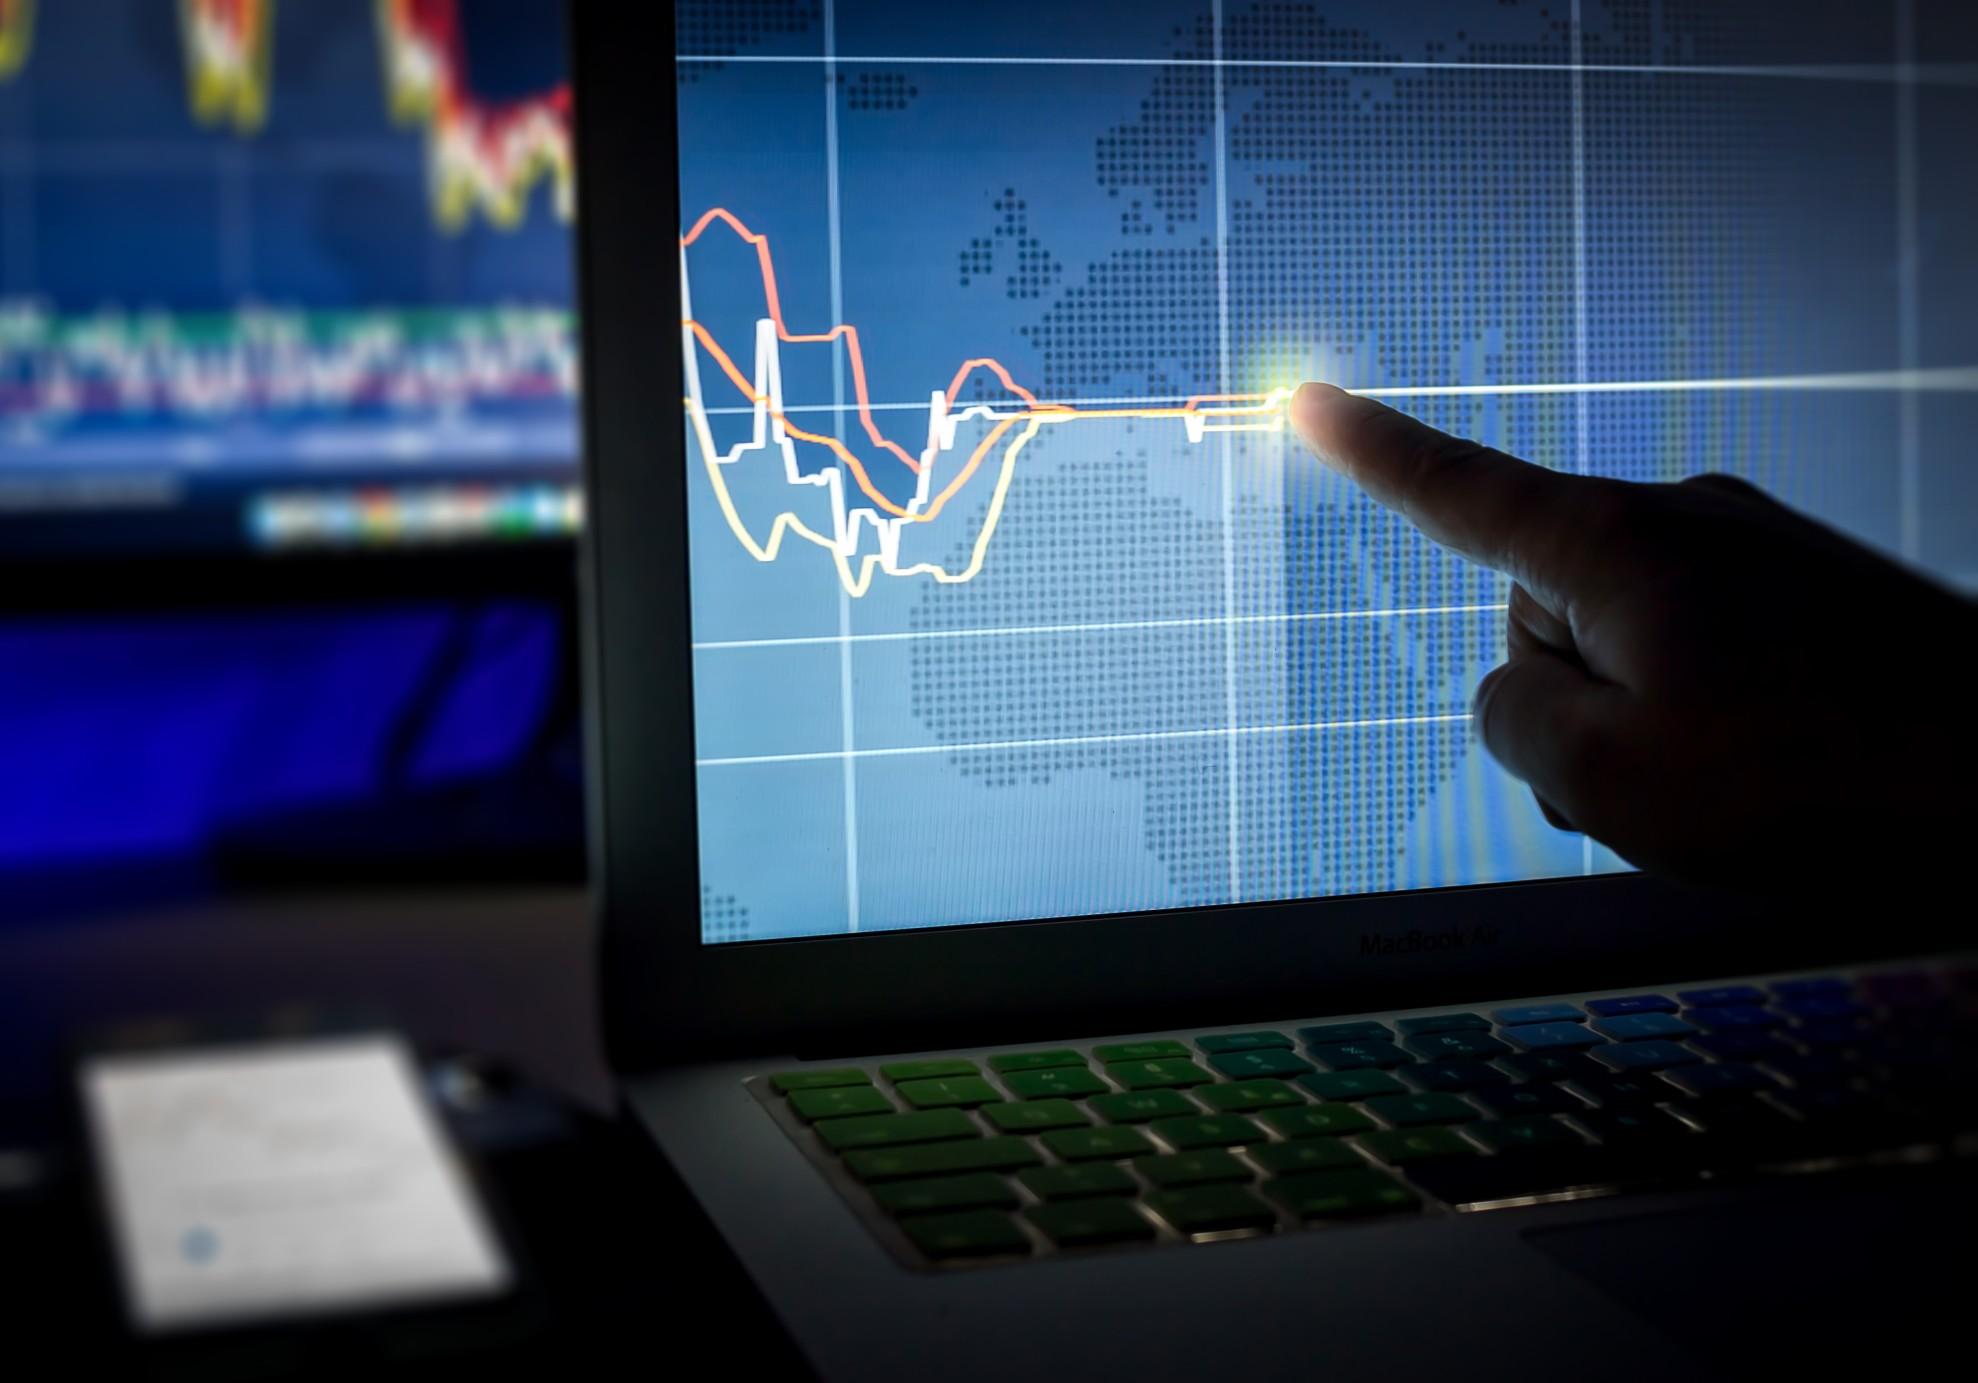 btc fiyat analizi 17 eylul 2020